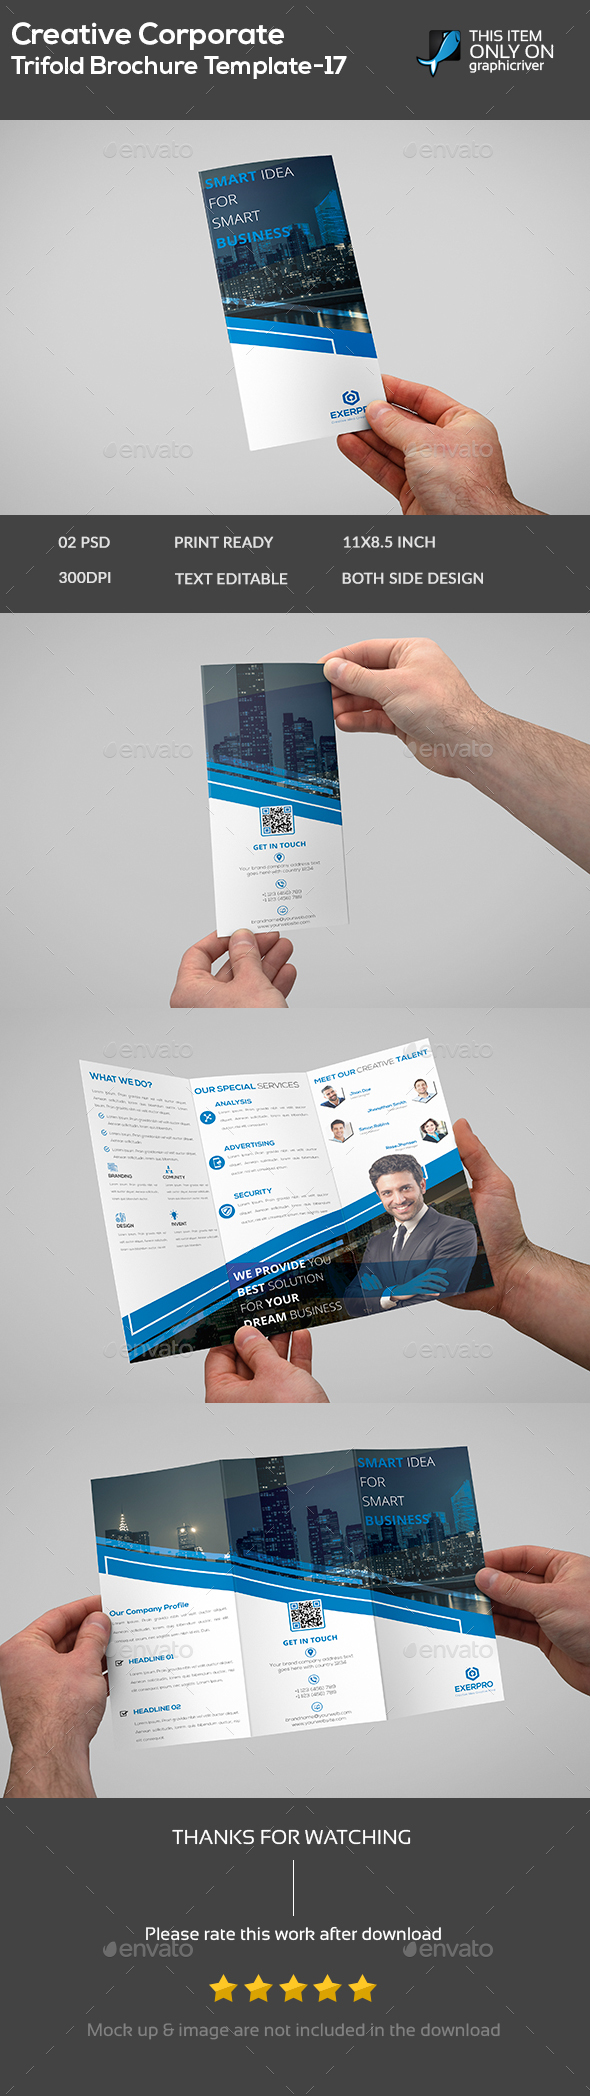 Creative Corporate Trifold Brochure Template -17 - Brochures Print Templates